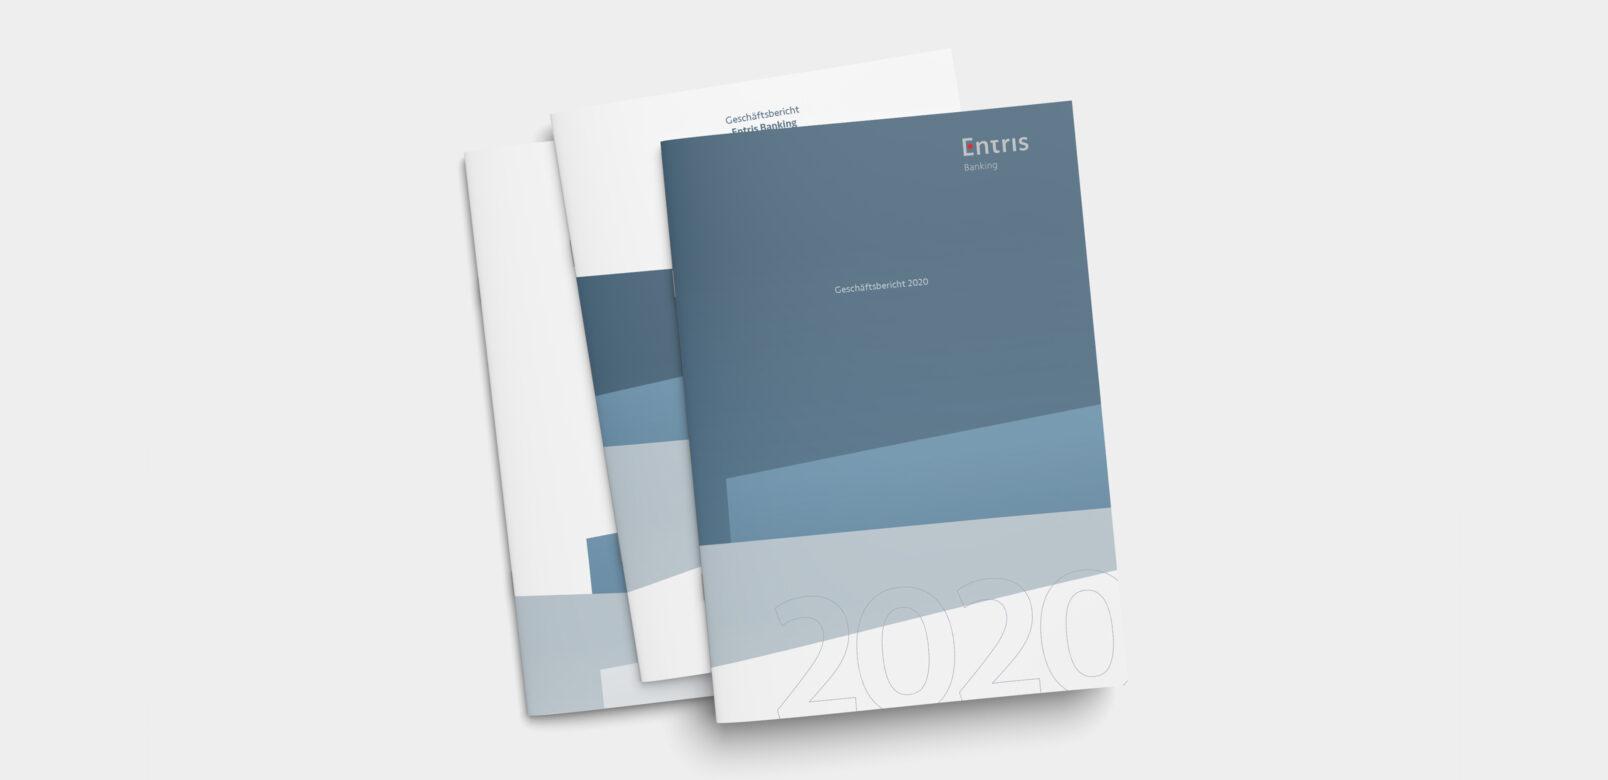 Covers - Entris Banking Geschäftsbericht, Agentur Schmucki